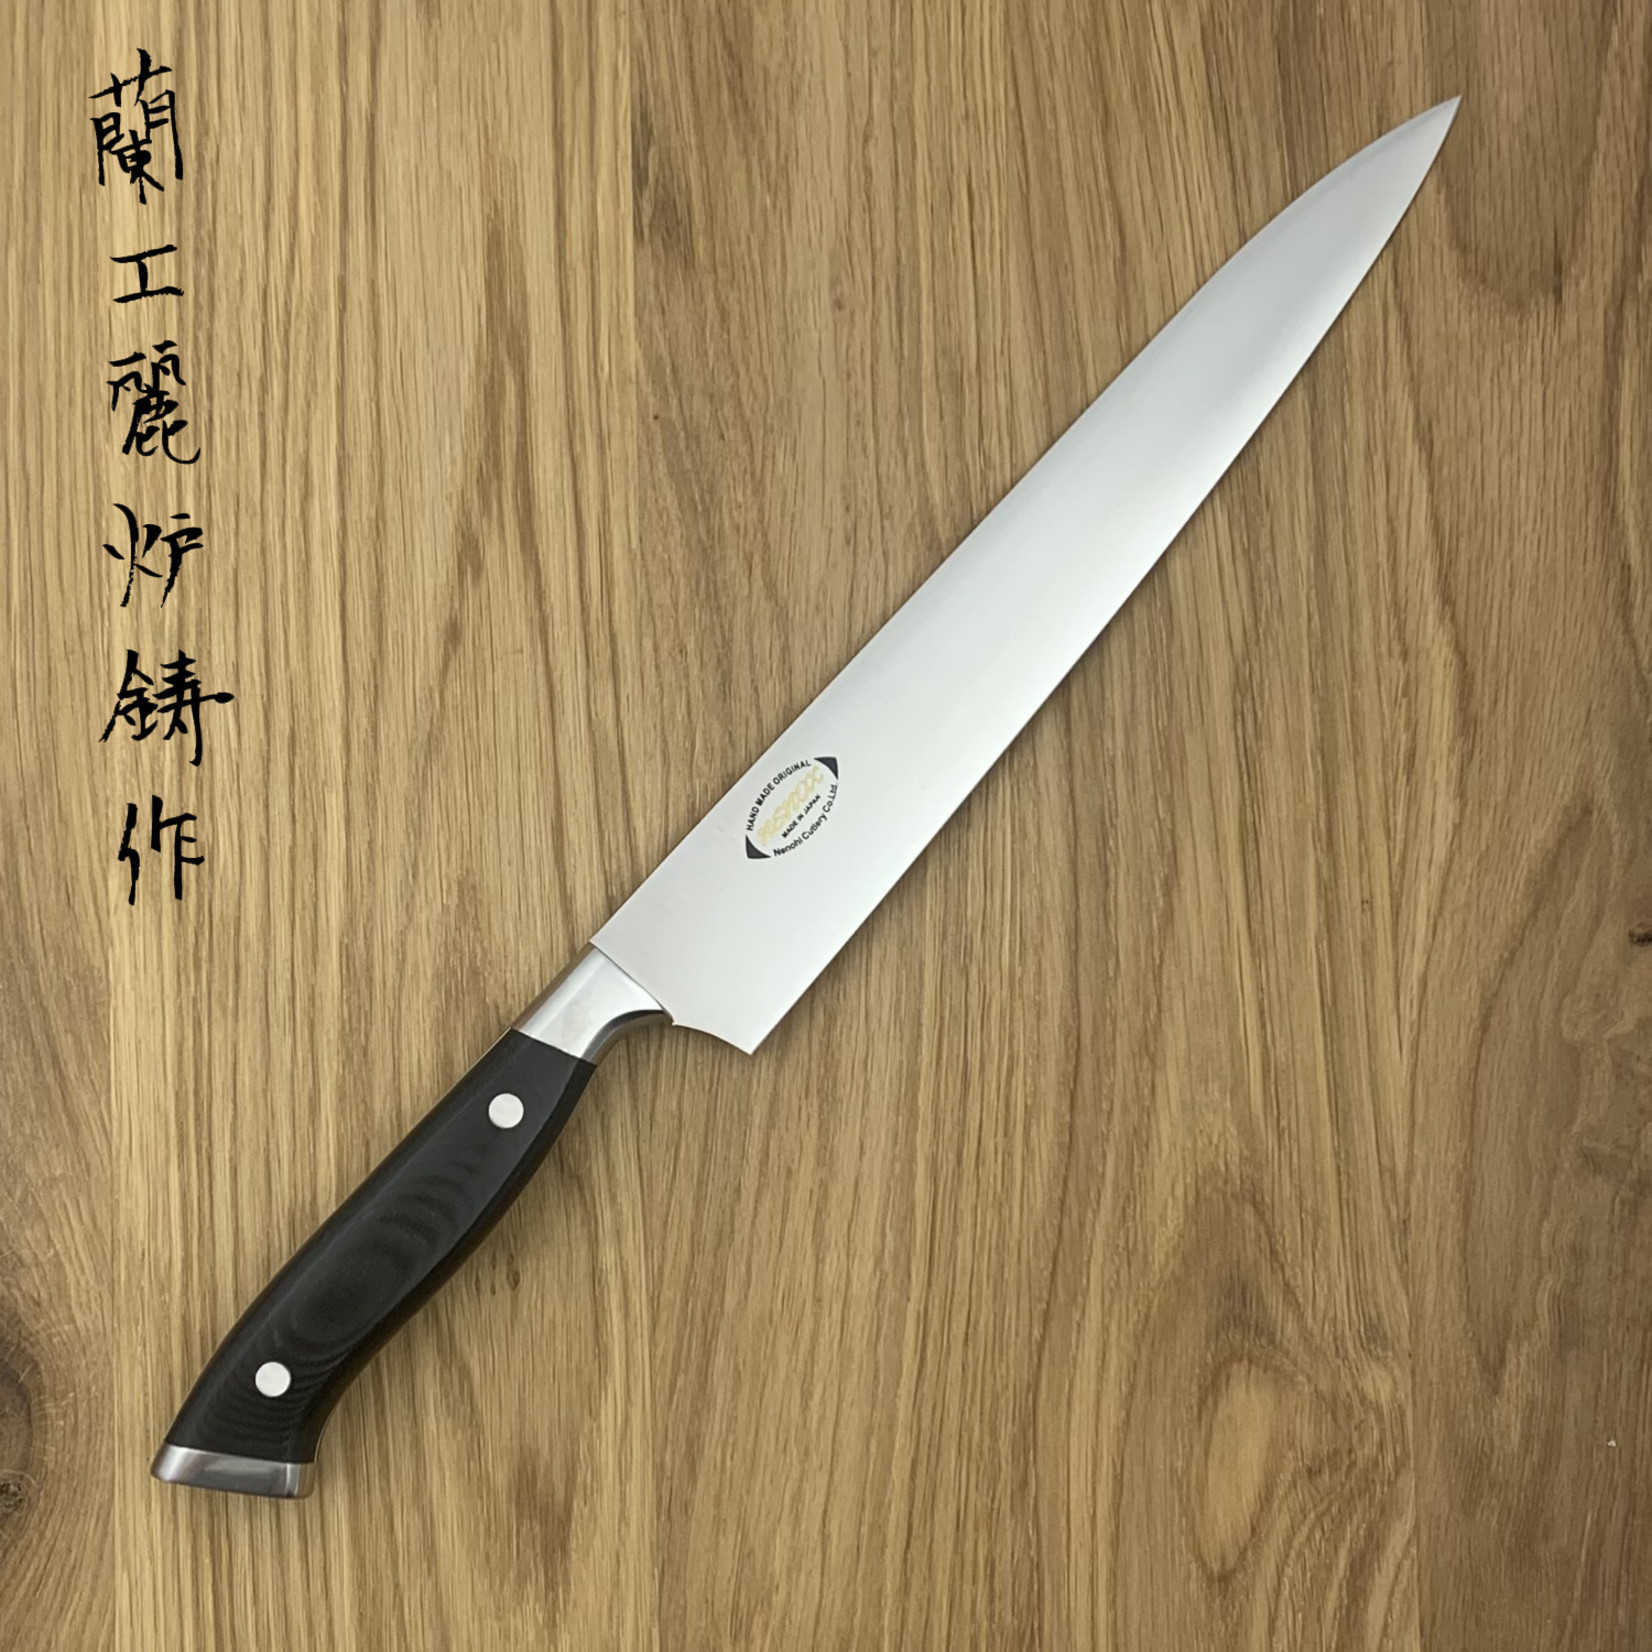 NENOHI NENOX S Sujihiki 230 mm Black